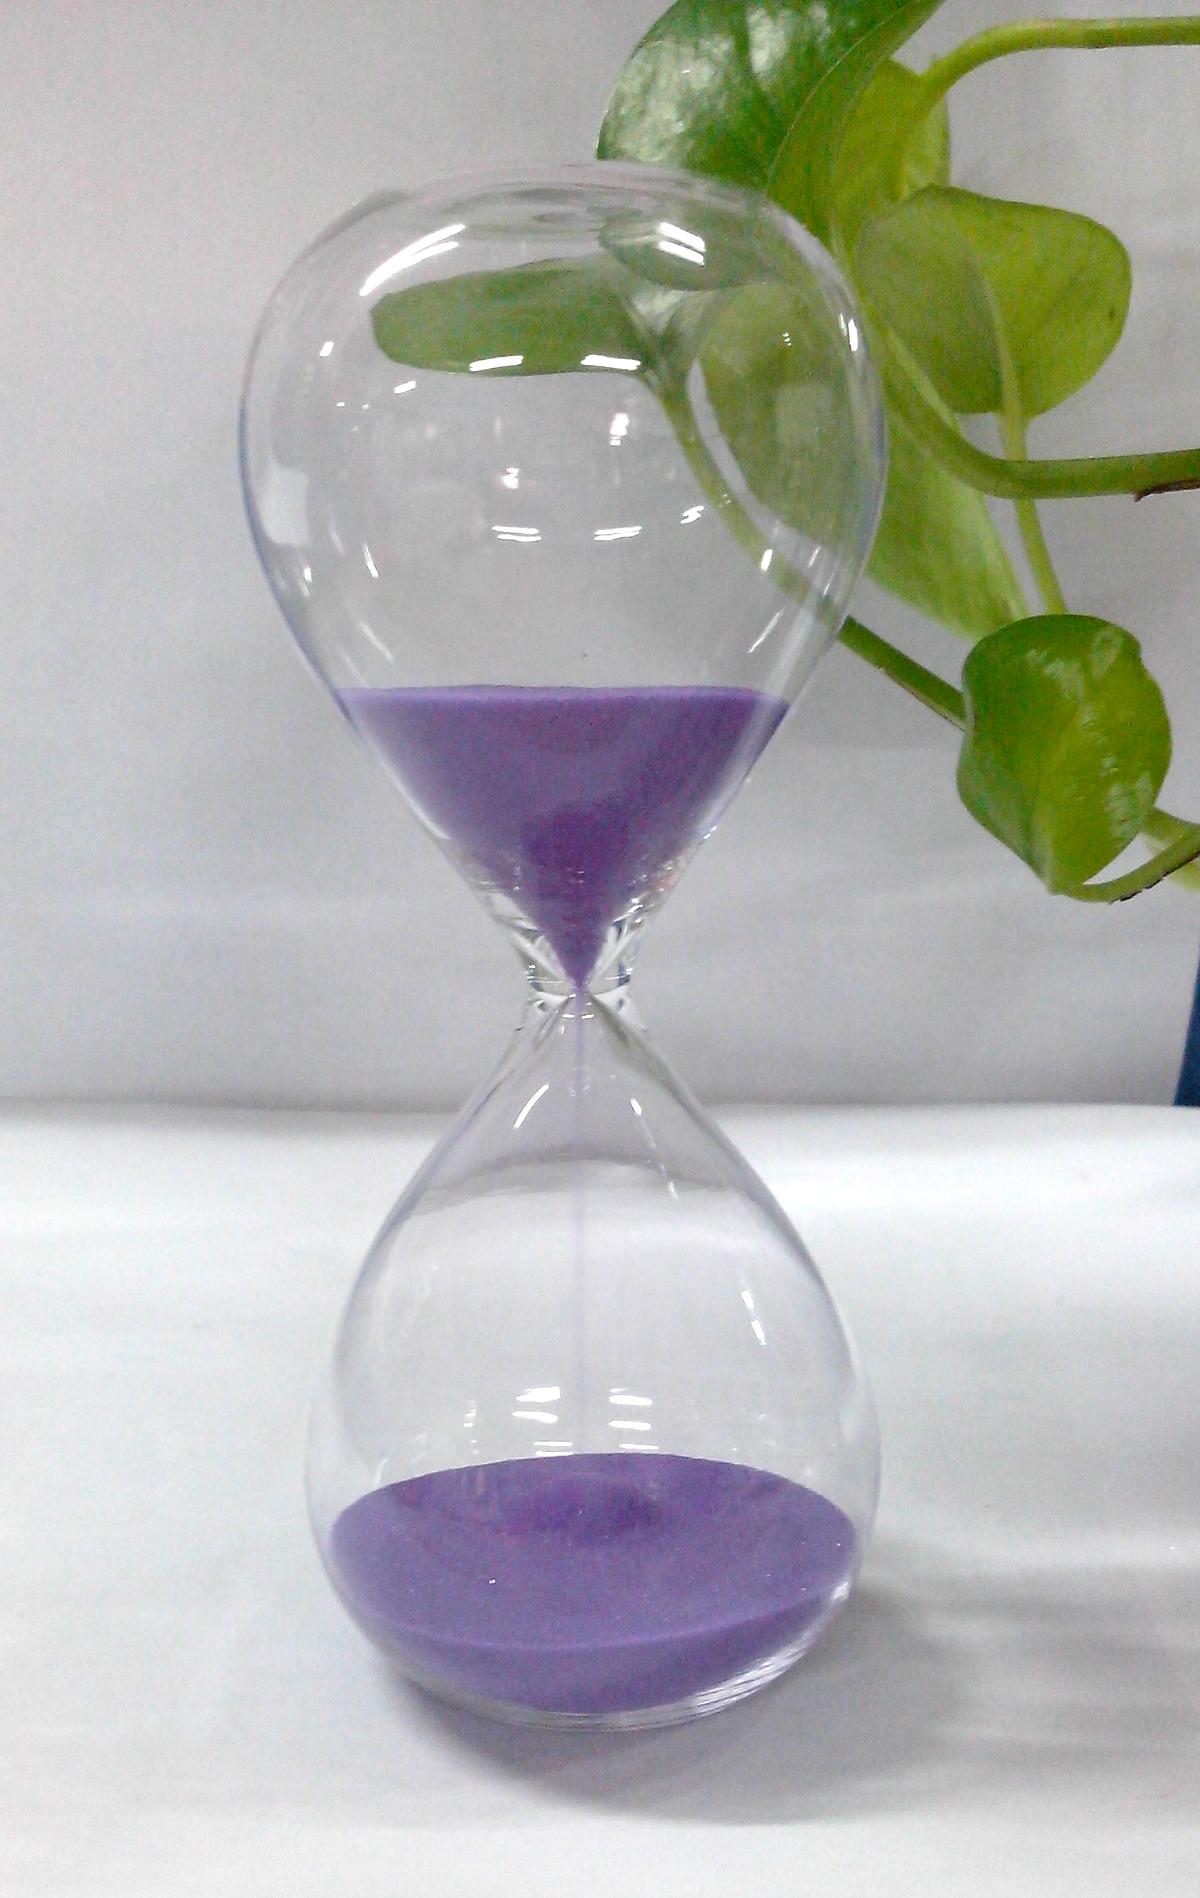 15 Minutes Hourglass Sandglass Sand Timer Purple